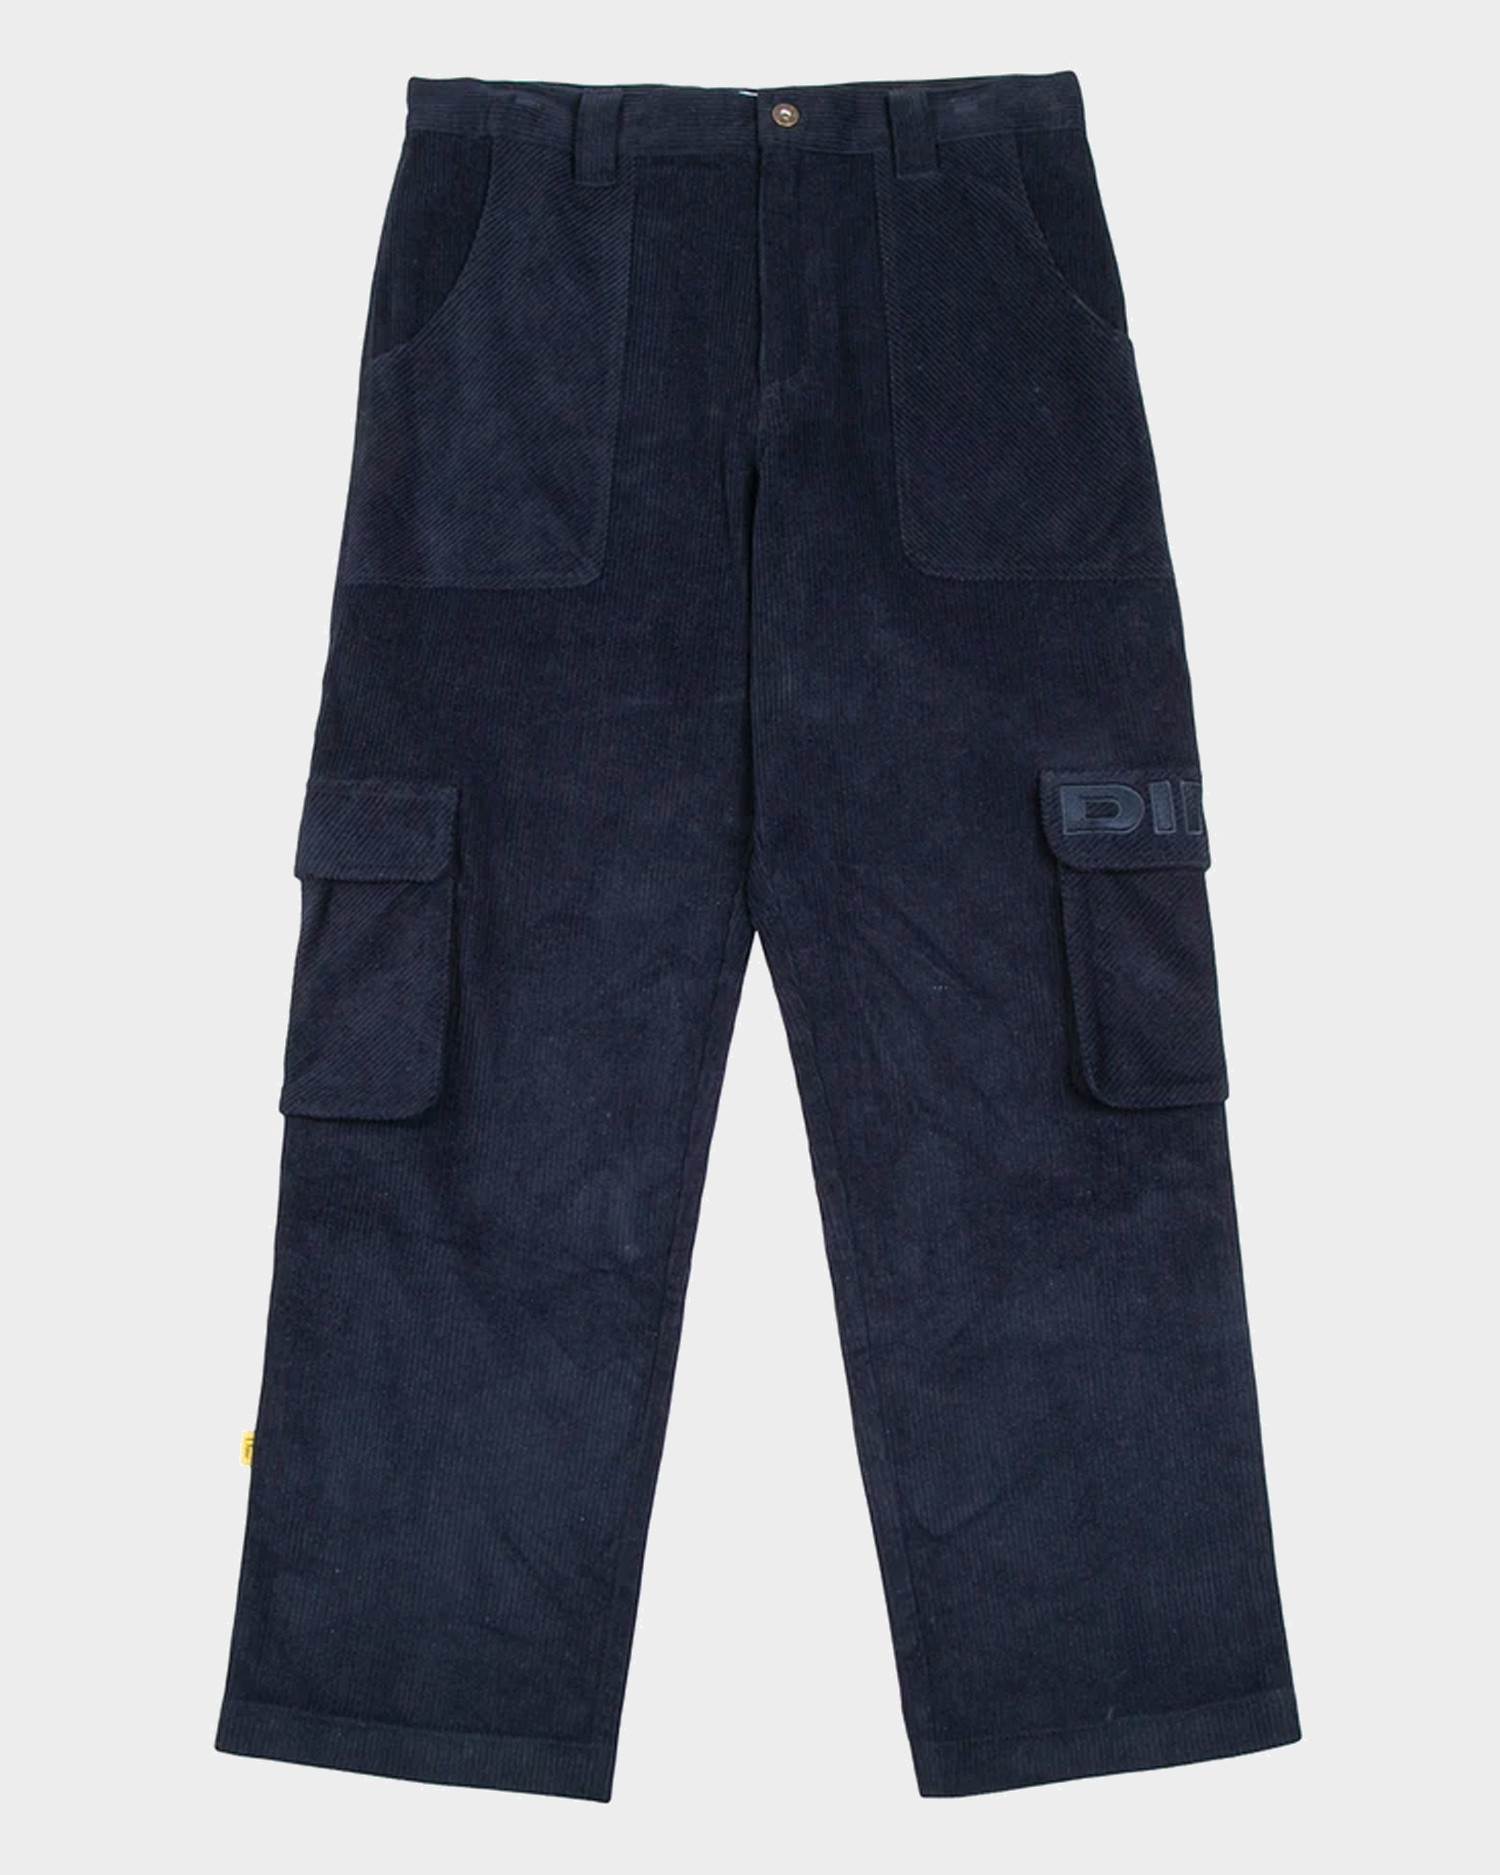 Dime Corduroy Cargo Pant Navy